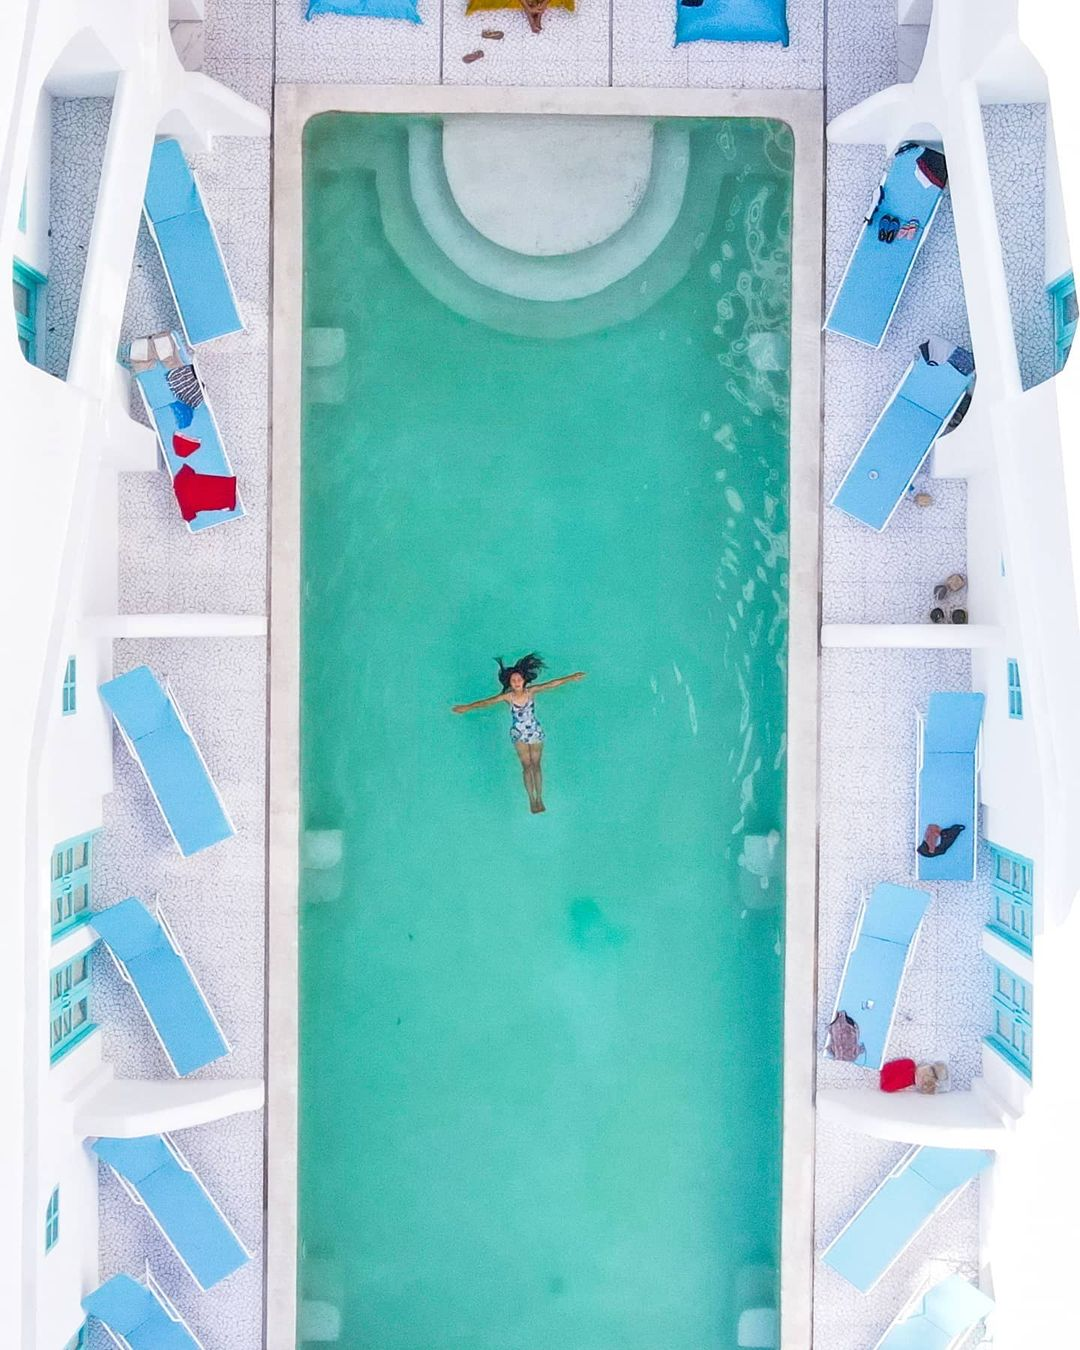 Berenang Di Loccal Collection Hotel Labuan Bajo Image From @discovabali